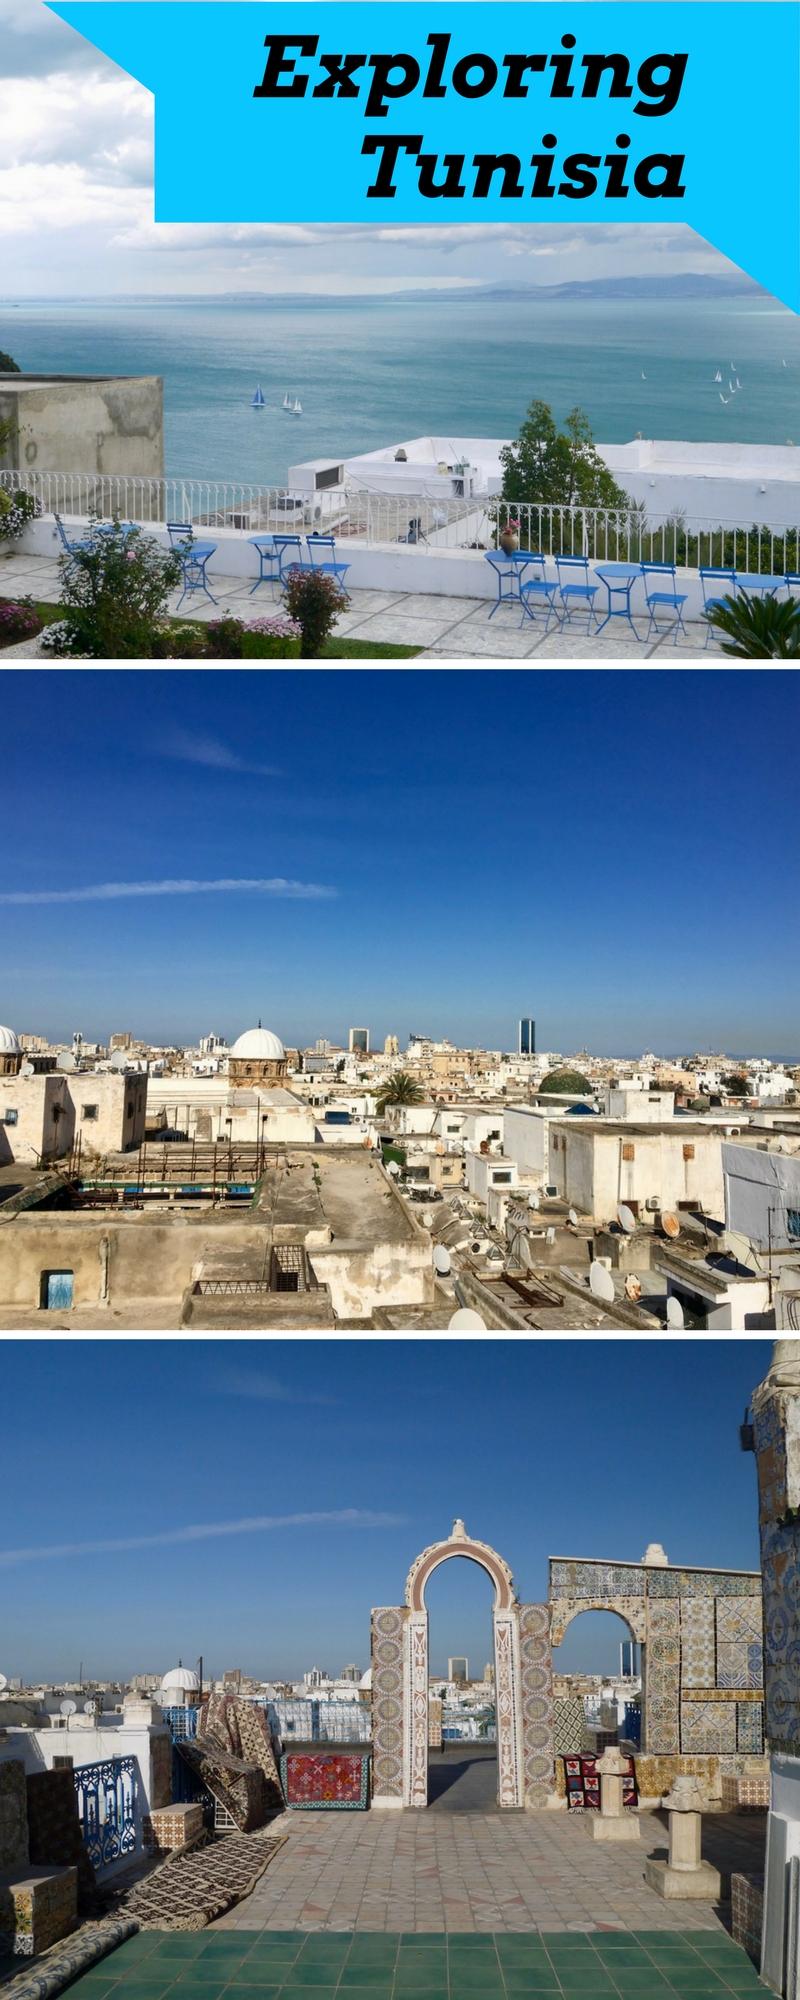 Exploring Tunisia - Day Trips from Tunis - Exploring Tunisia